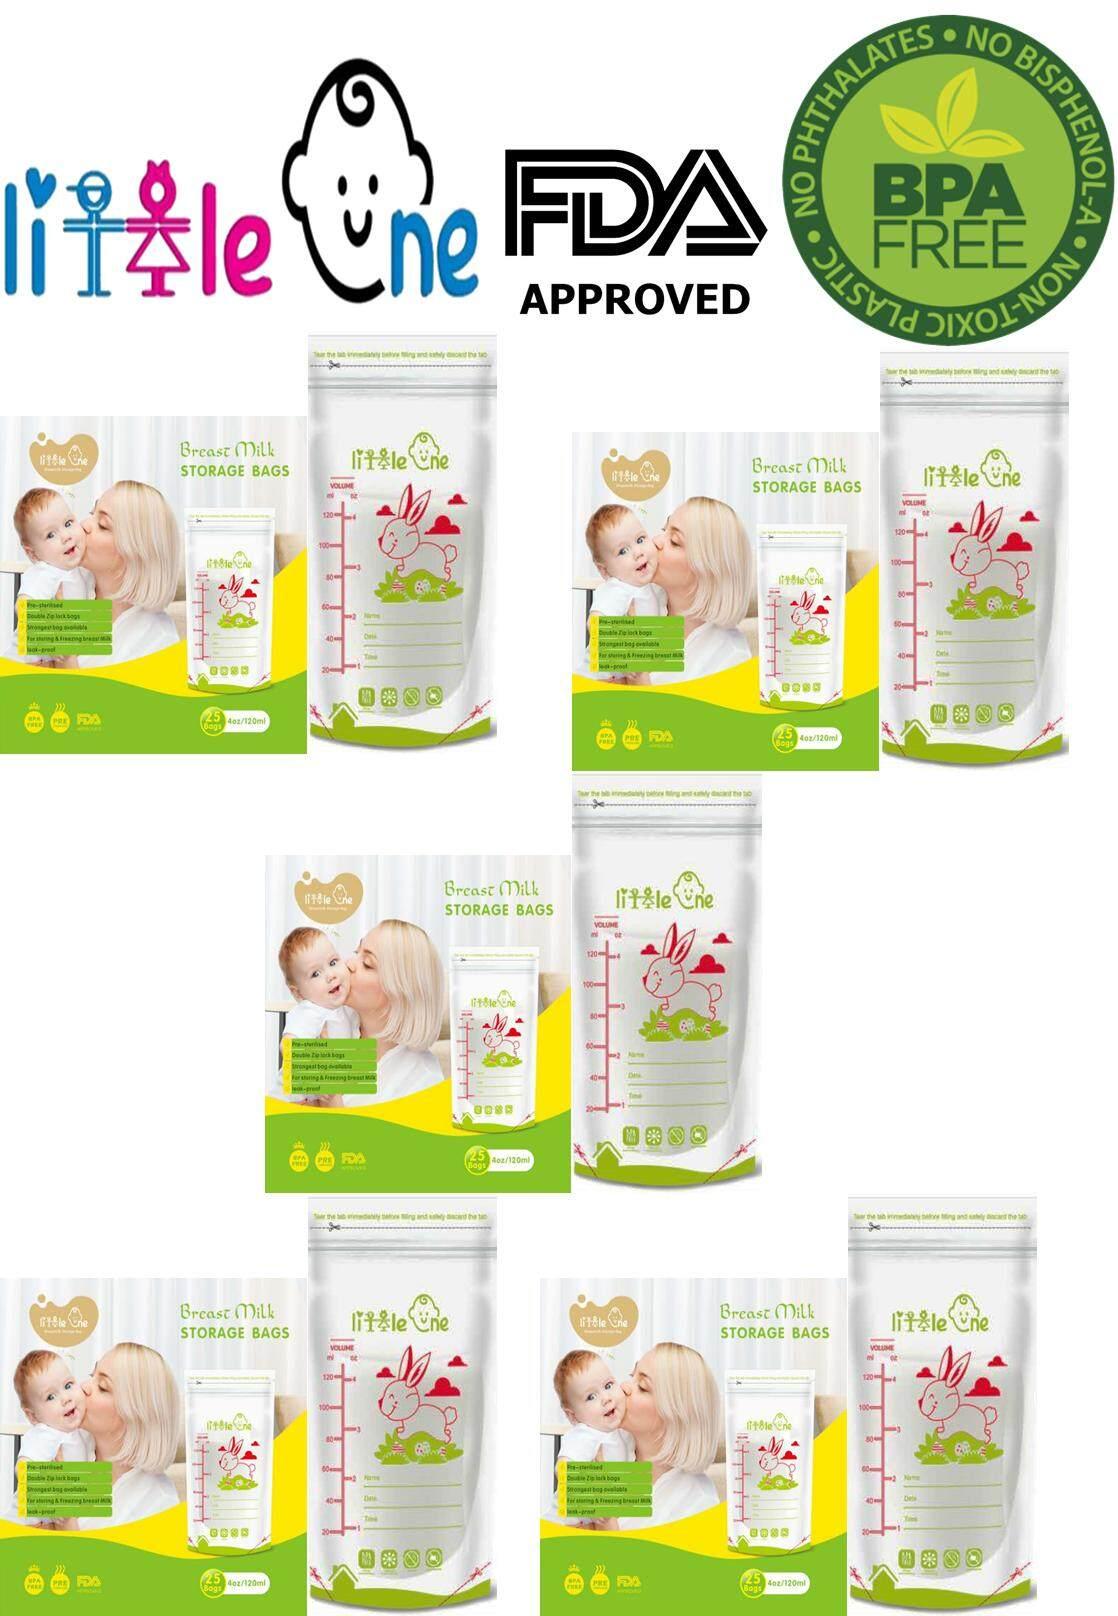 5 X Little One Double Ziplock Breast Milk Storage Bag 4oz/5oz/7oz Best Seller! By Littleonebaby.